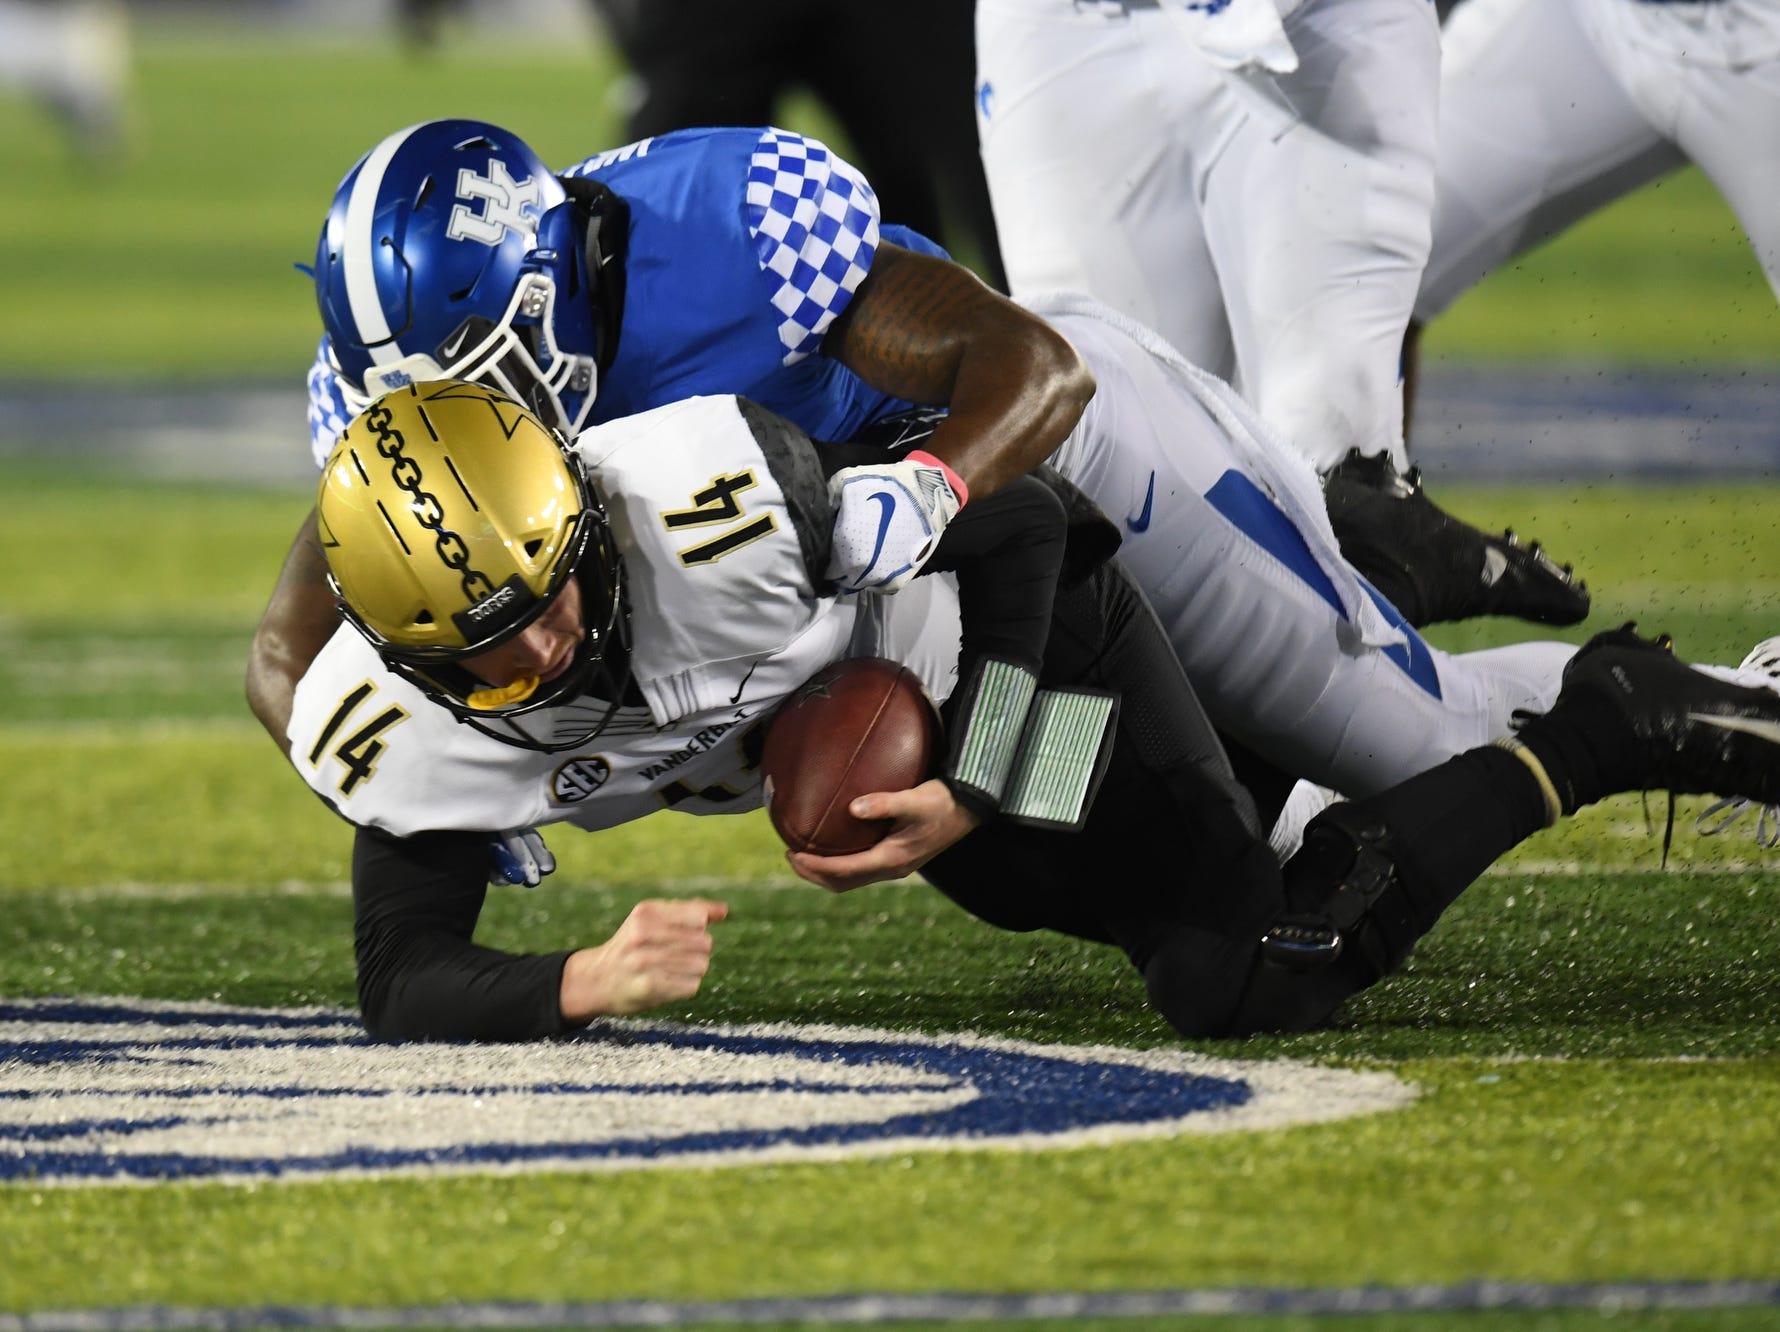 "UK SLB Jamar ""Boogie"" Watson gets a sack during the University of Kentucky football game against Vanderbilt at Kroger Field in Lexington, Kentucky on Saturday, October 20, 2018."